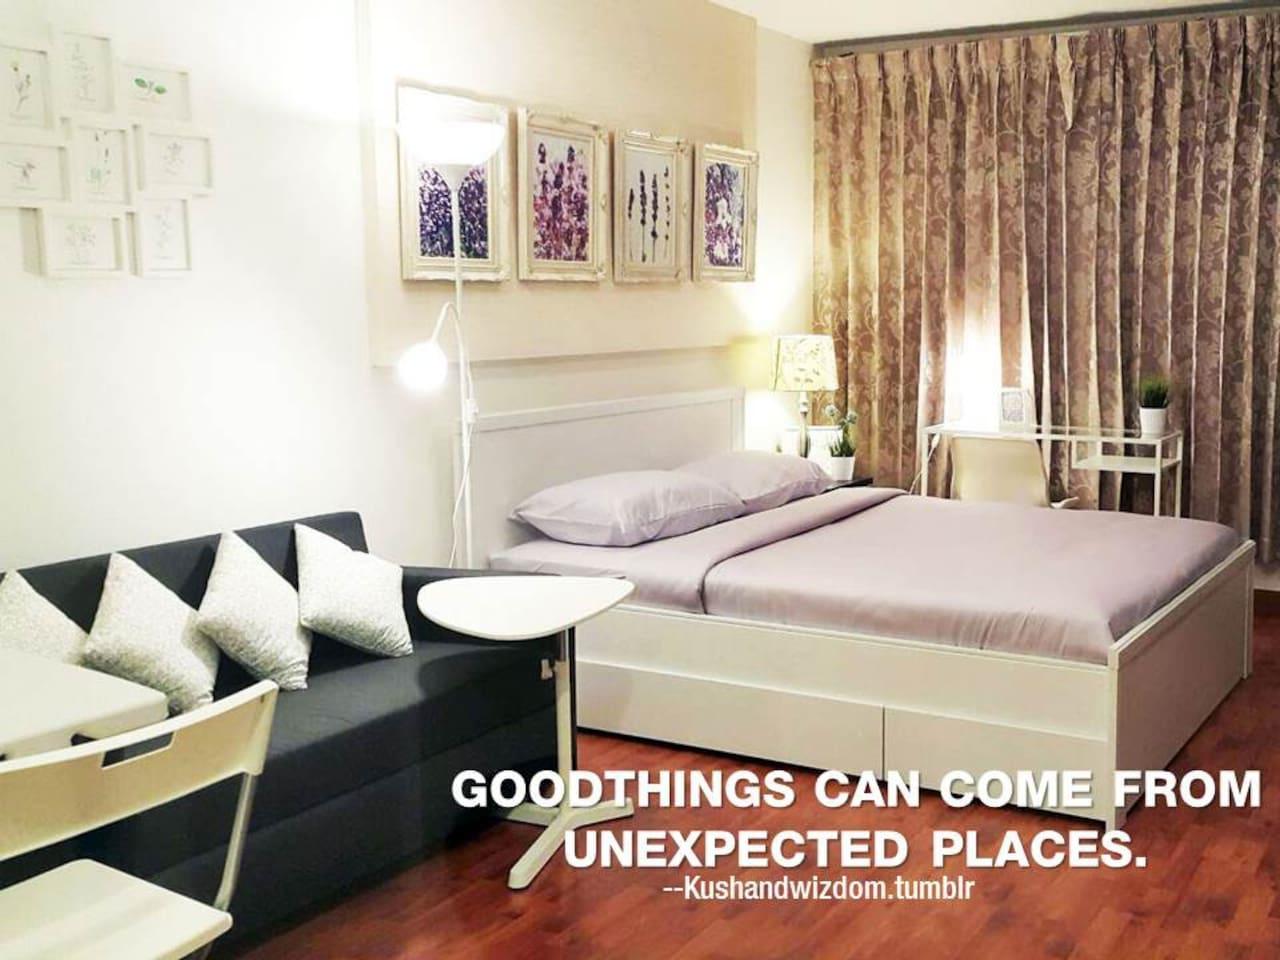 Air-condition, bed and sofa bed can sleep up to 4 people, 1 bathroom with separate area, kitchen and bathroom. With electrical appliances. ห้องแอร์ชุดเตียงคู่และเตียงโซฟา นอนได้สูงสุด 4 คน 1 ห้องน้ำ มีพื้นที่แยกส่วนครัวและห้องน้ำ พร้อมเครื่องใช้ไฟฟ้า